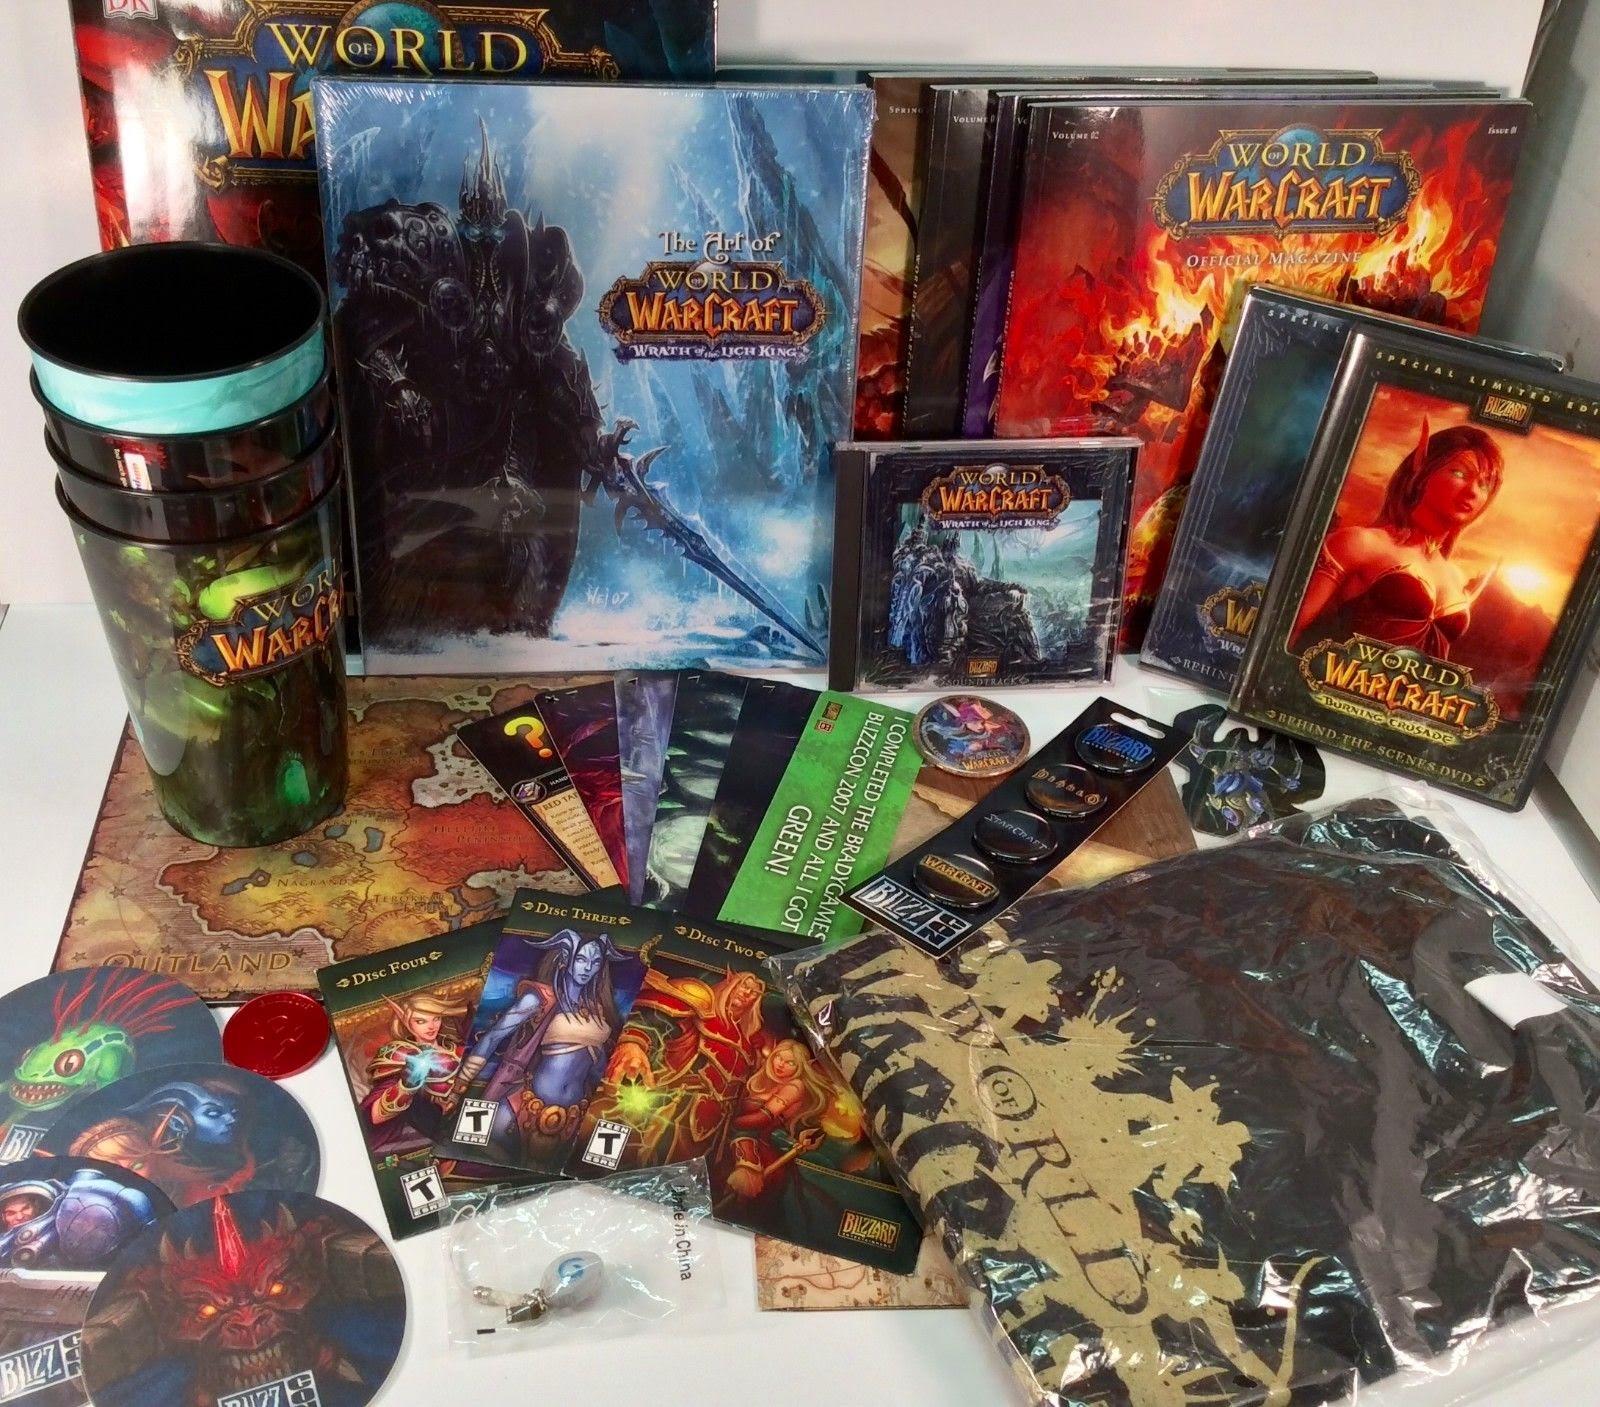 Gadźety World of Warcraft